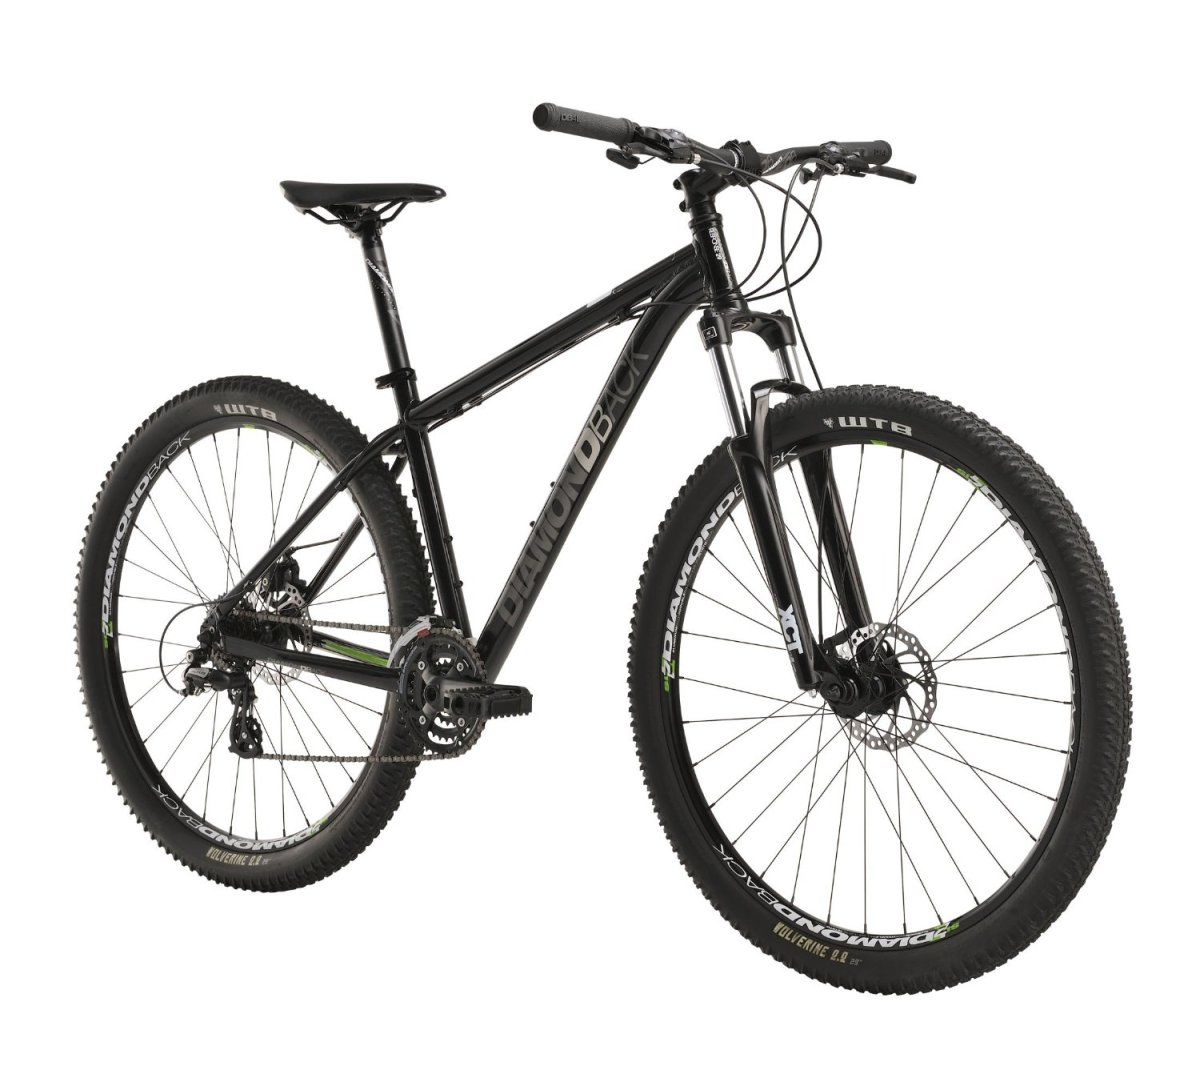 Diamondback Response Mountain Bike with 29-Inch Wheels